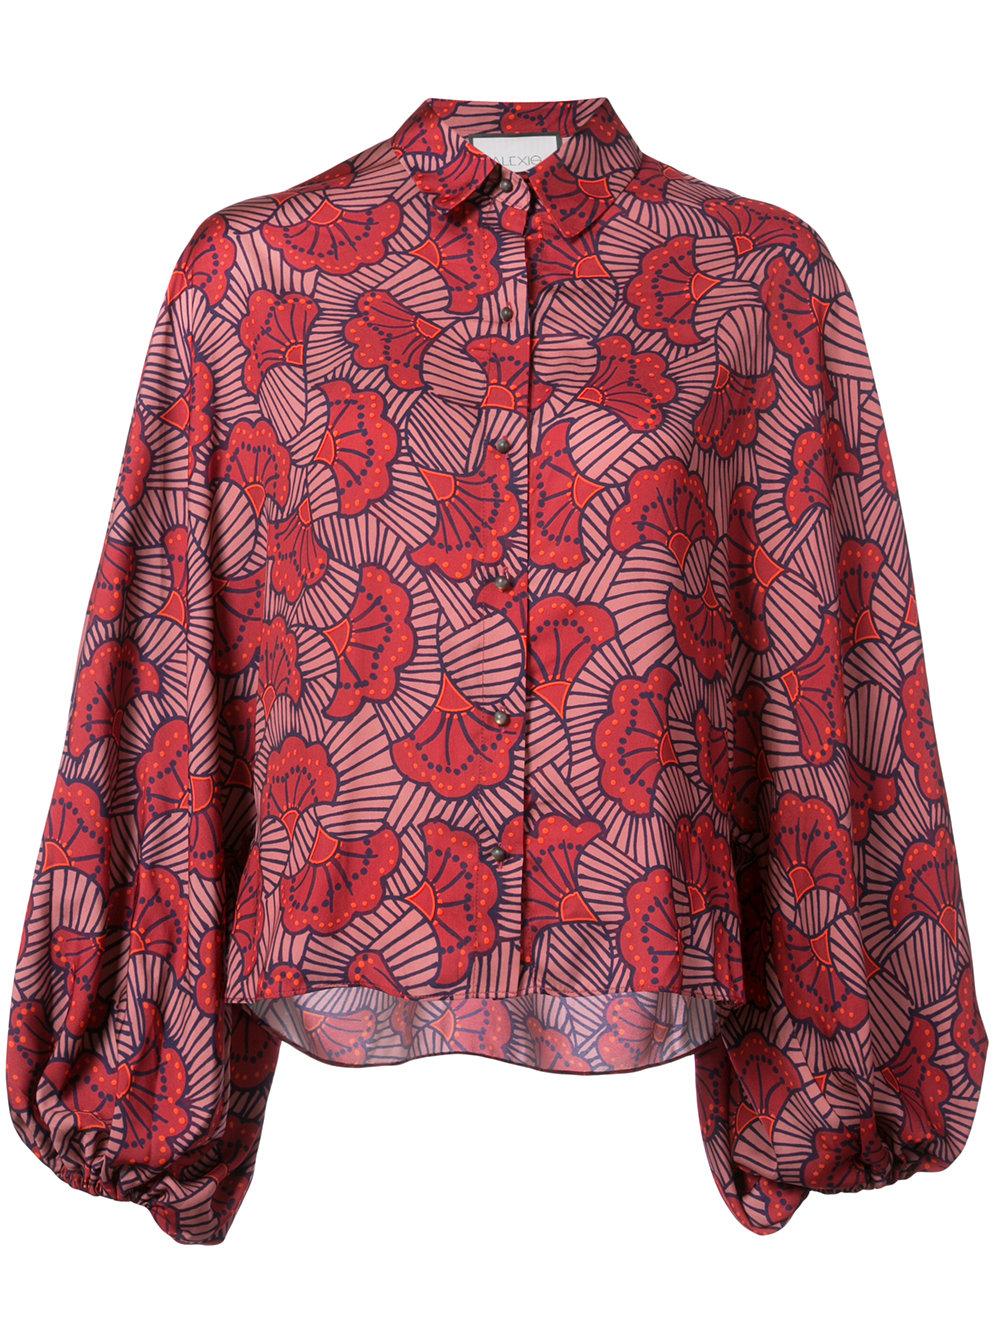 ALEXIS floral print shirt - $285